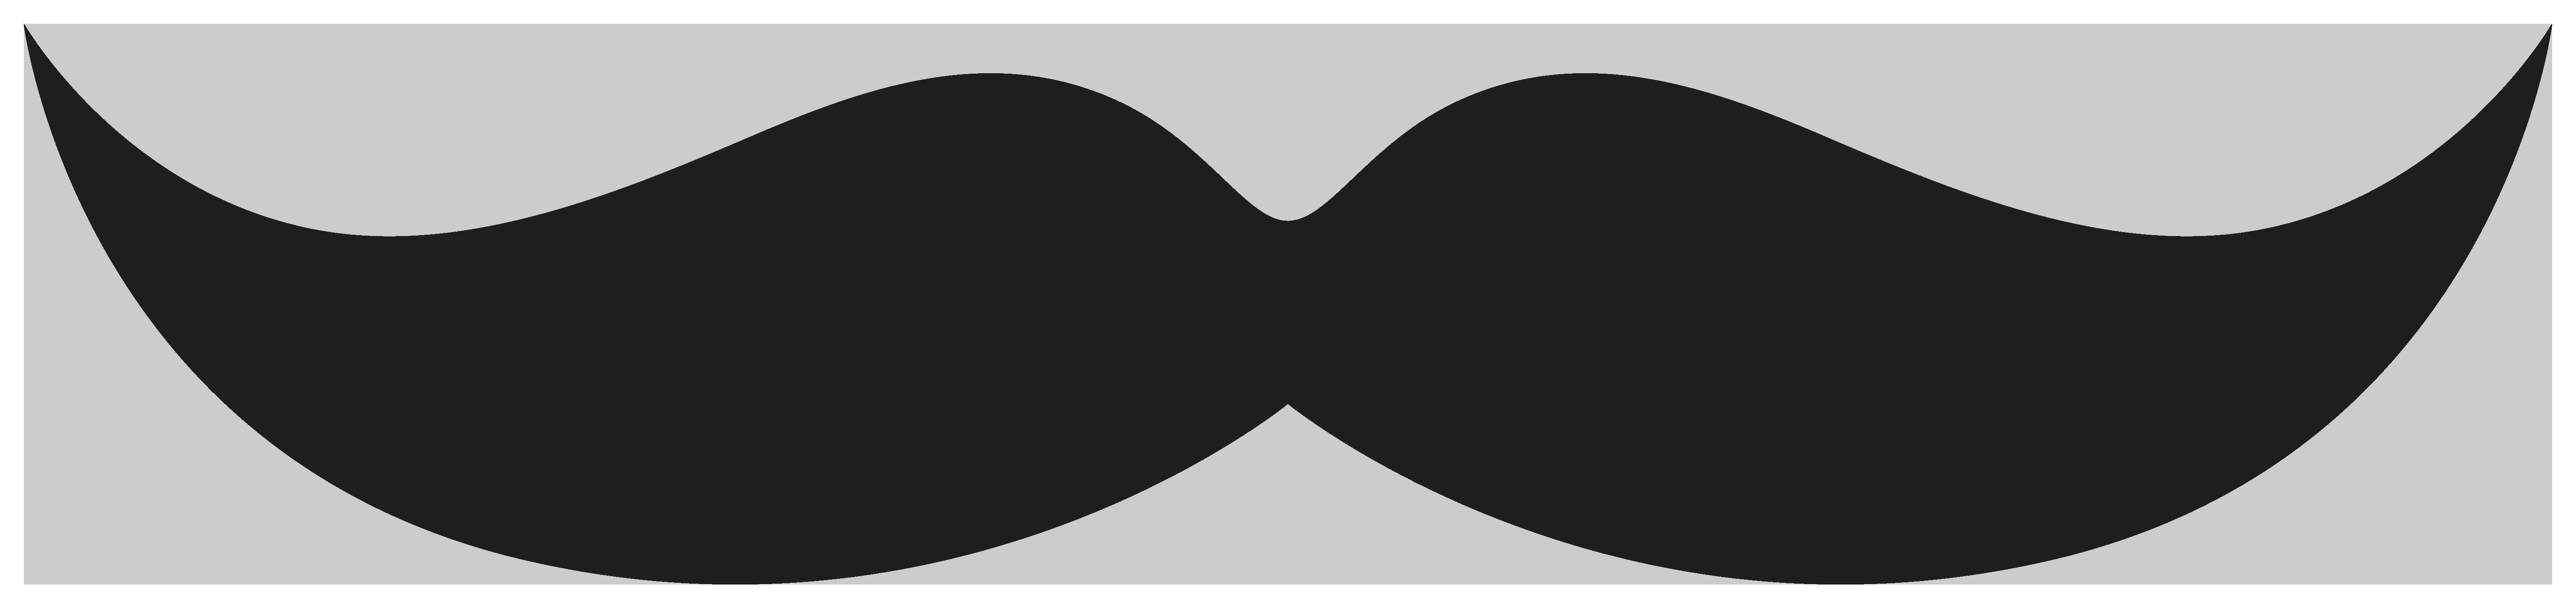 Mustache PNG - 16809